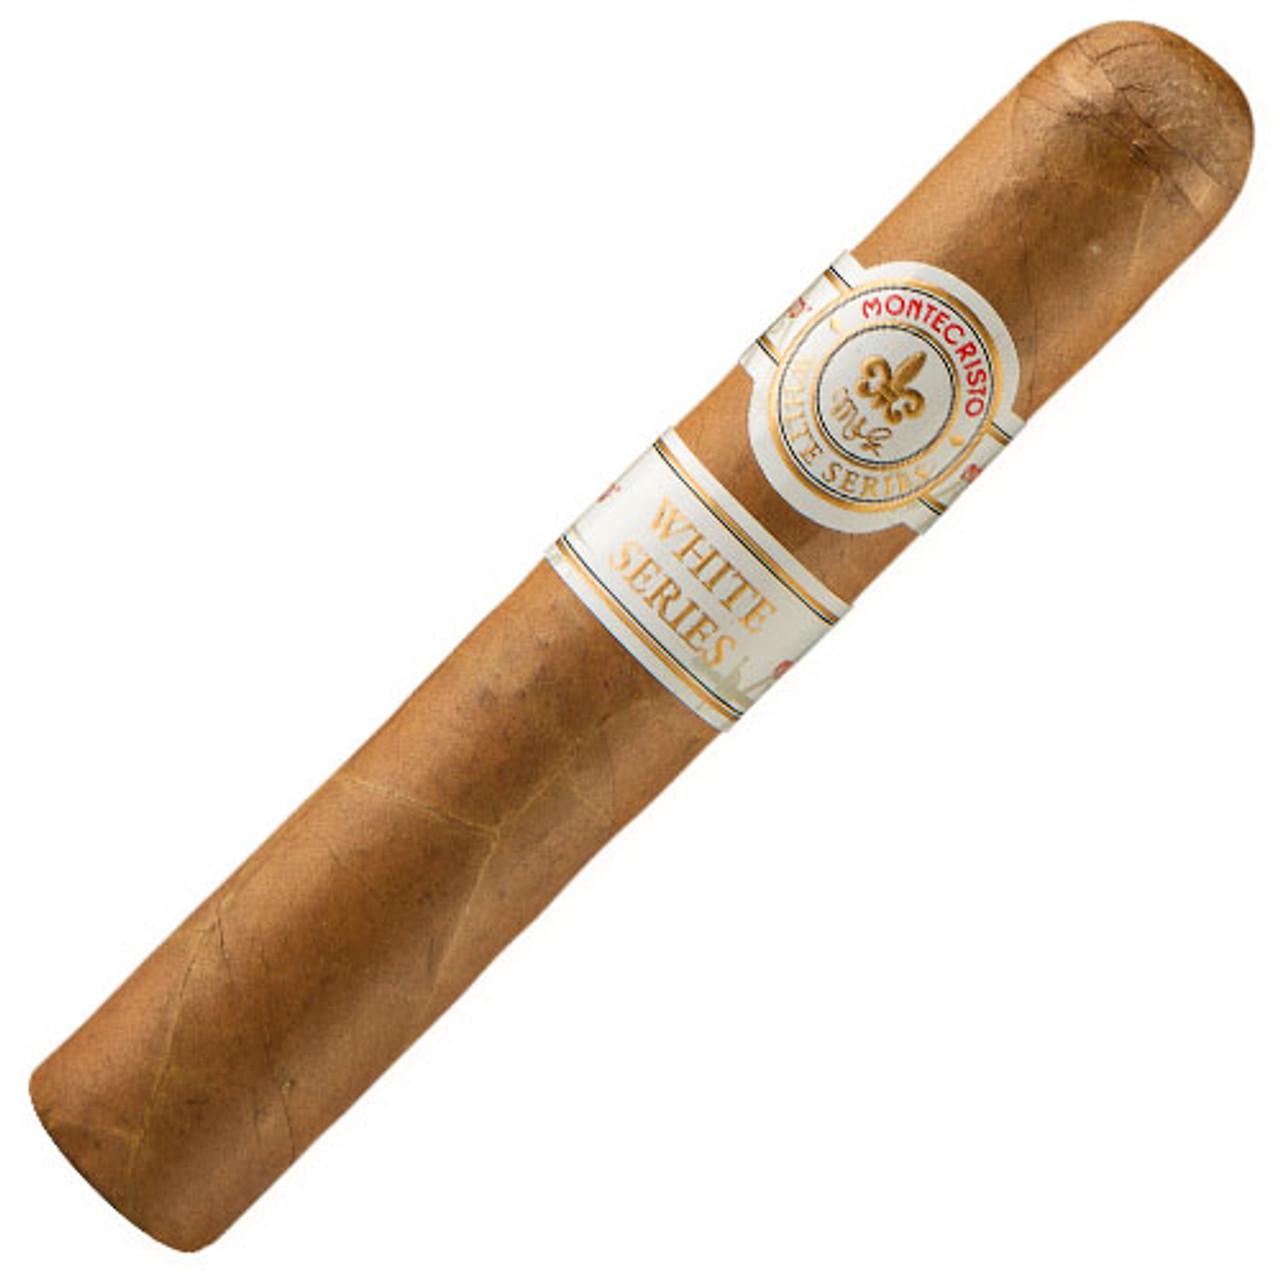 Montecristo White Series Rothchilde - 5 x 52 Cigars (Box of 27)